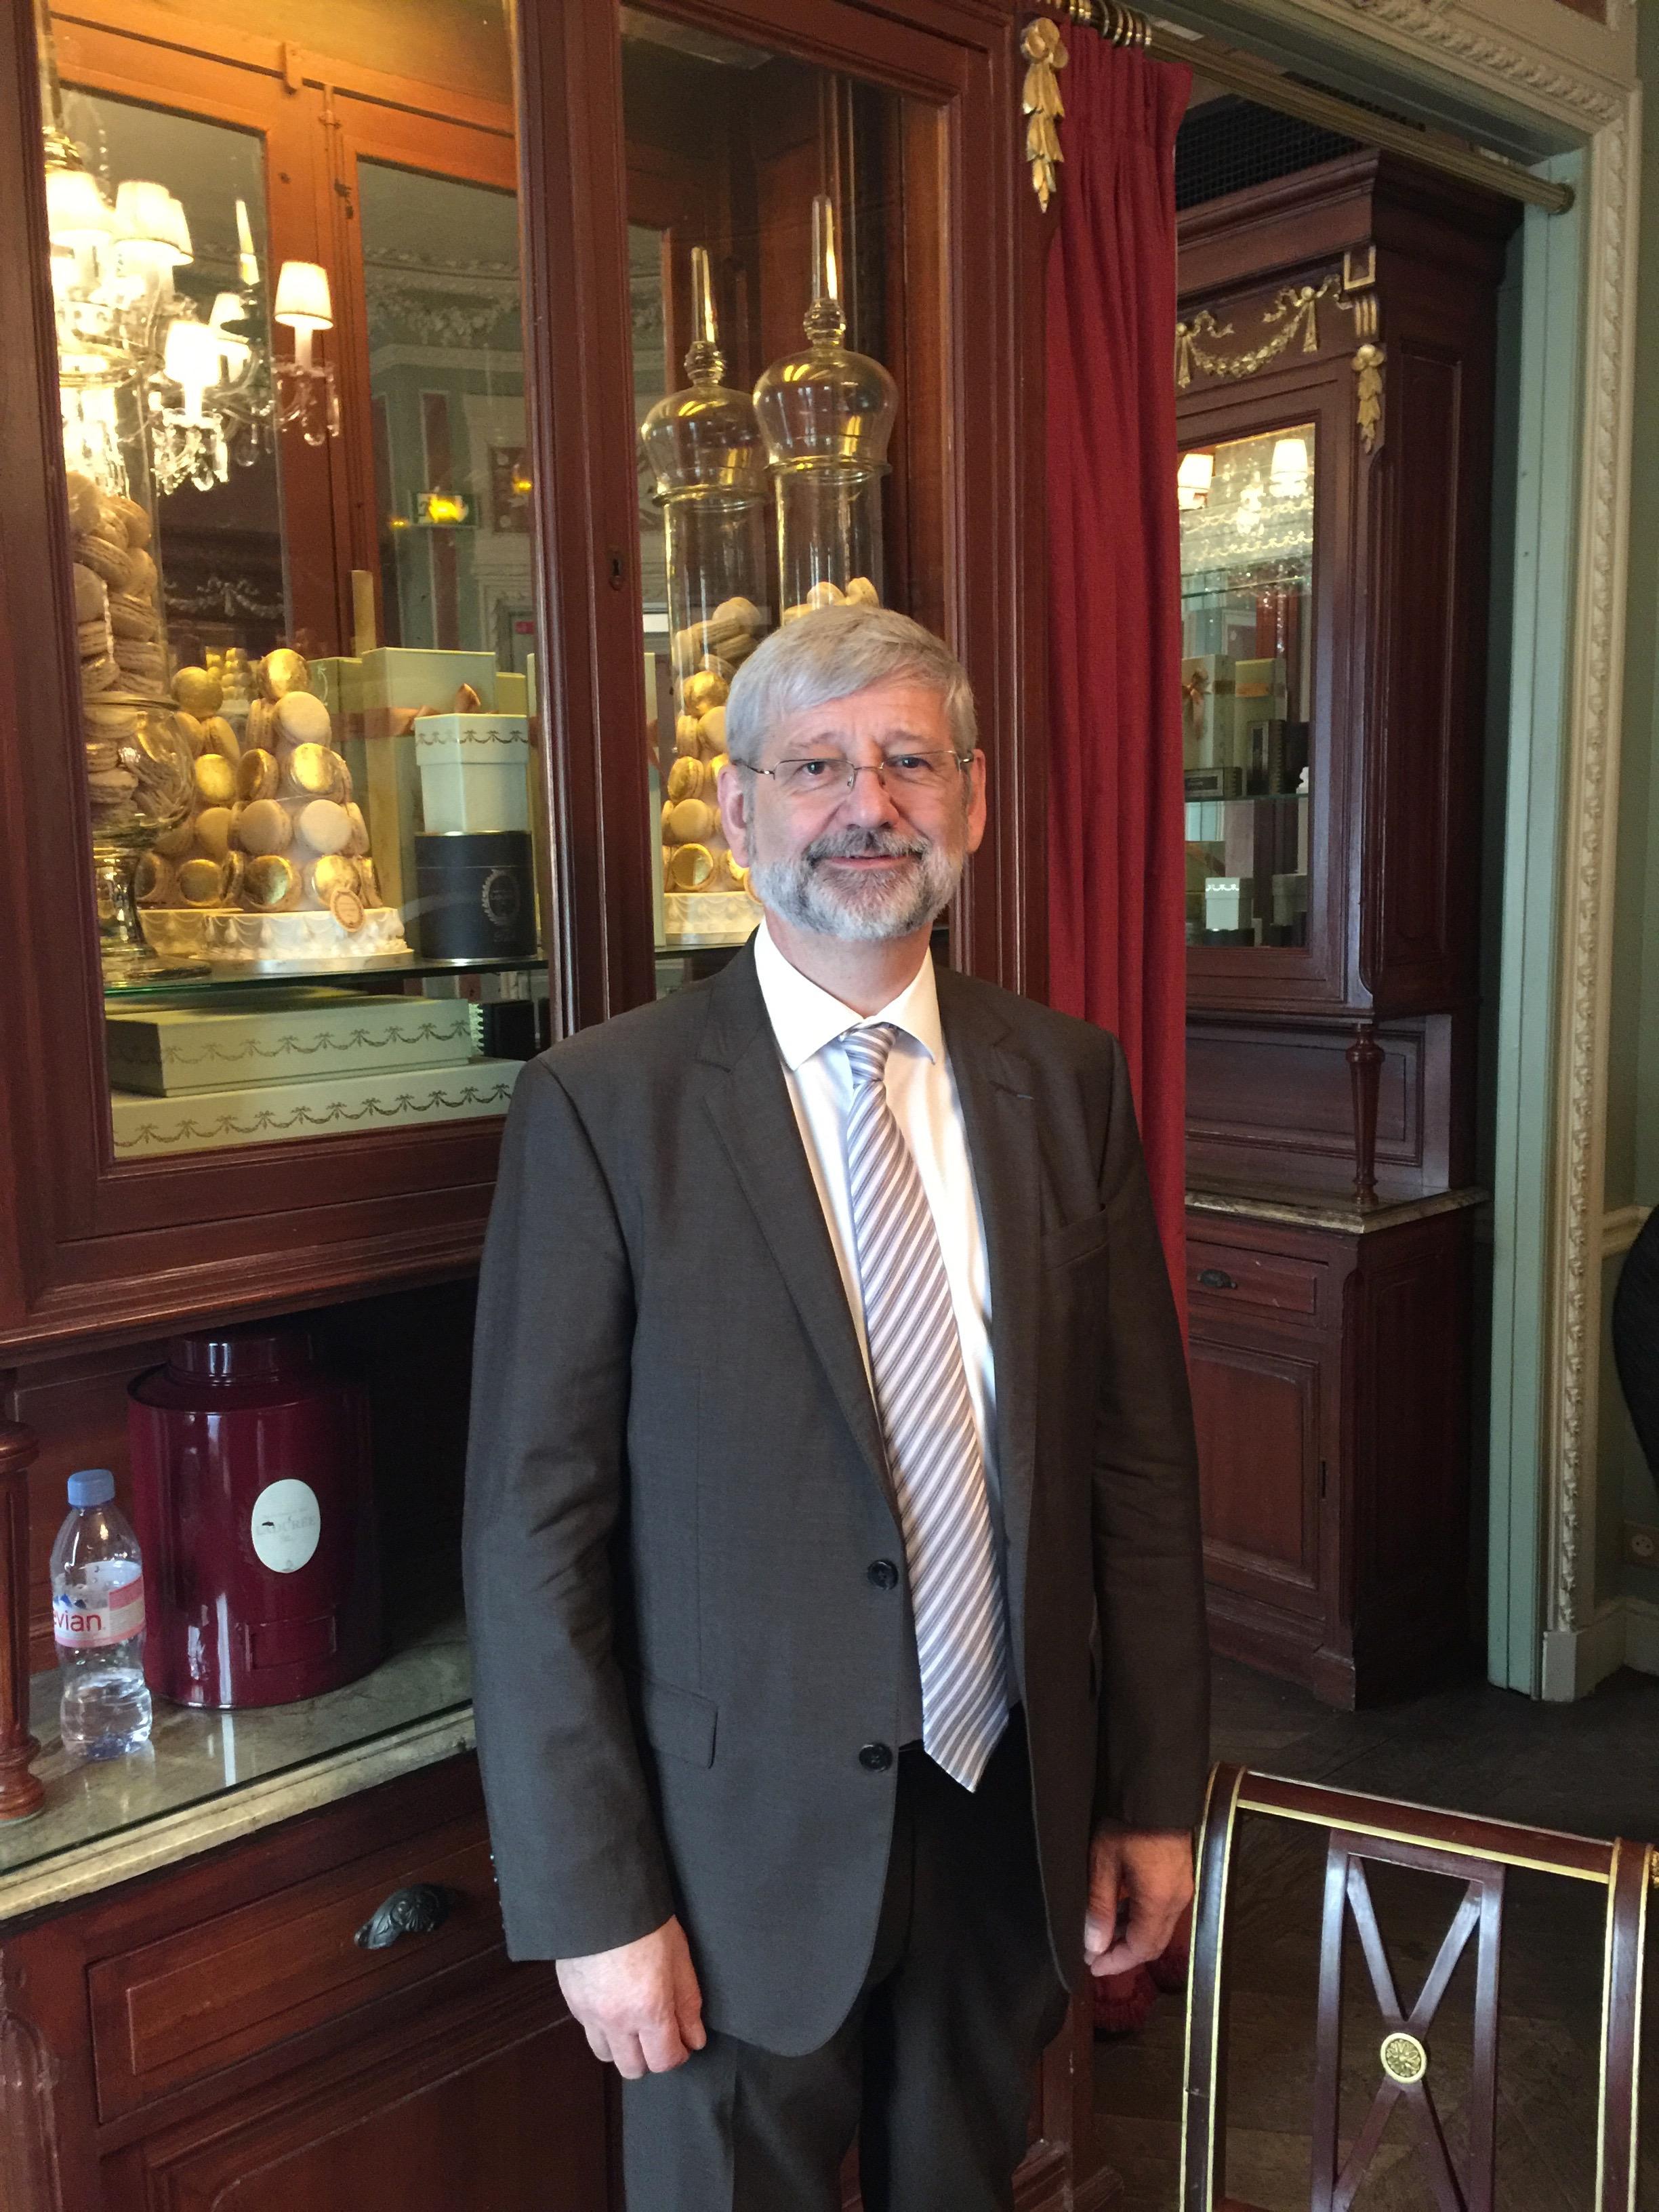 Bilan positif pour Alain Schmitt à Mines Albi